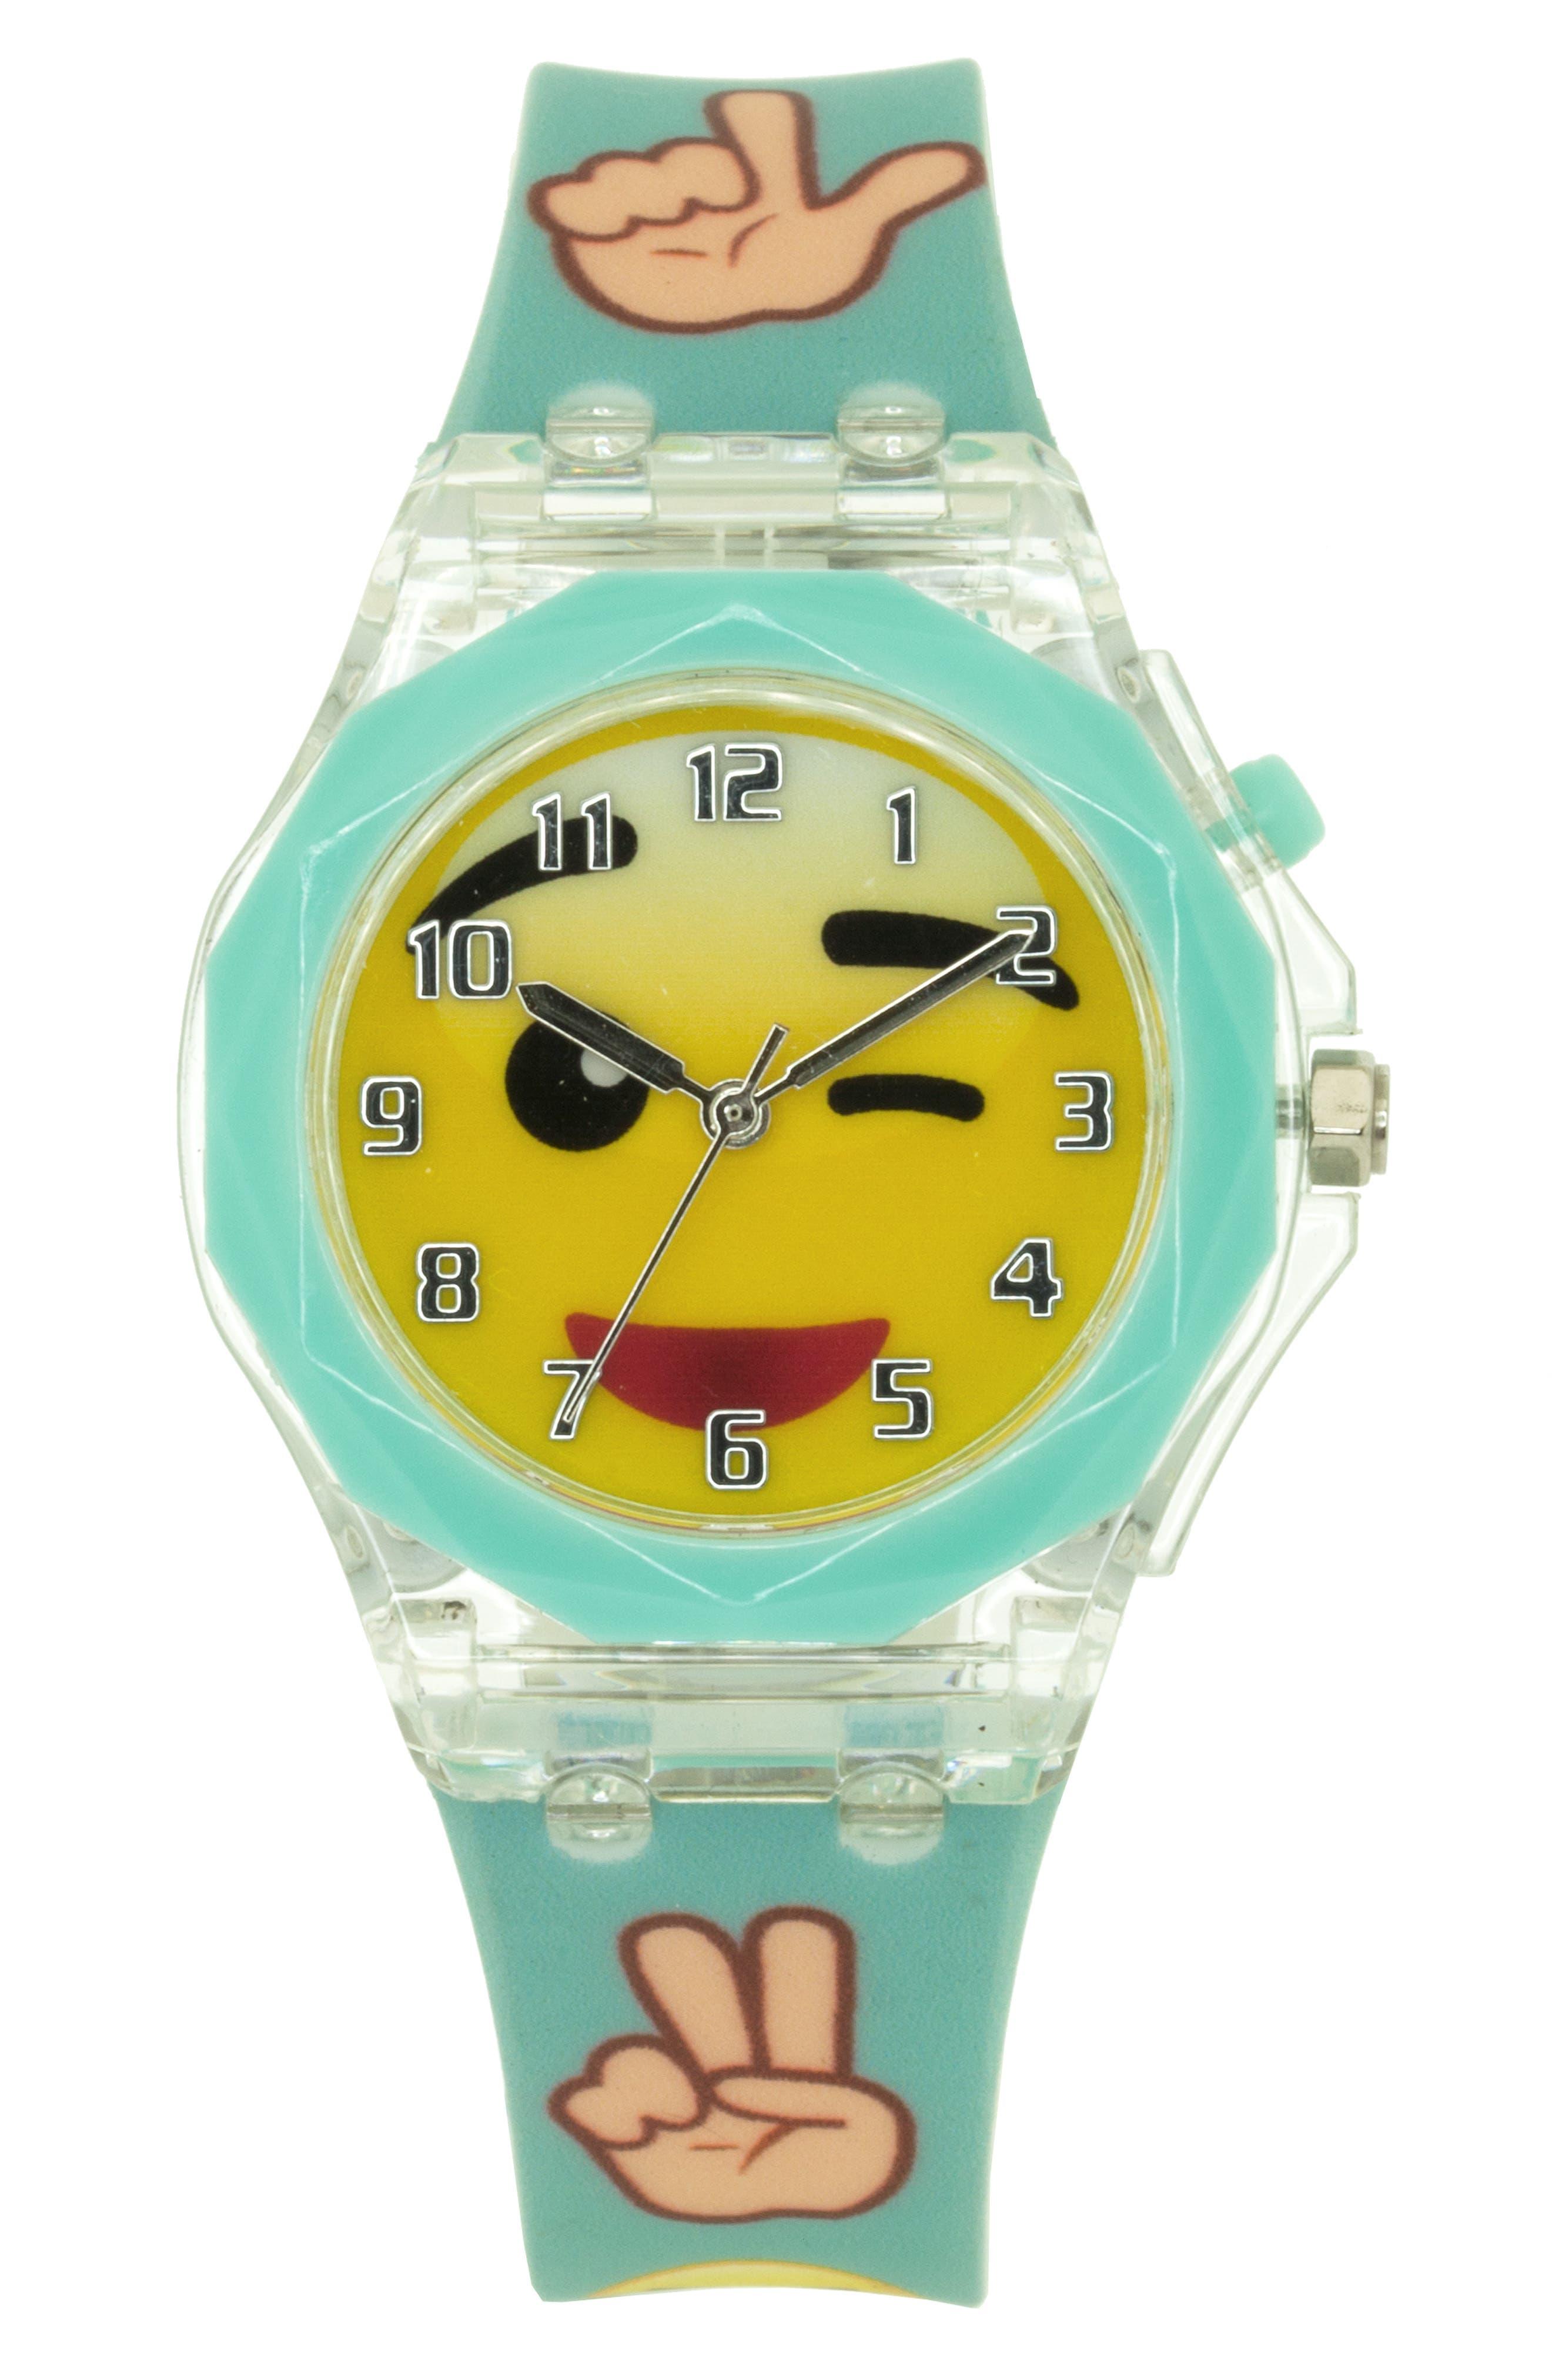 Girls Accutime Flashing Winking Emoji Watch